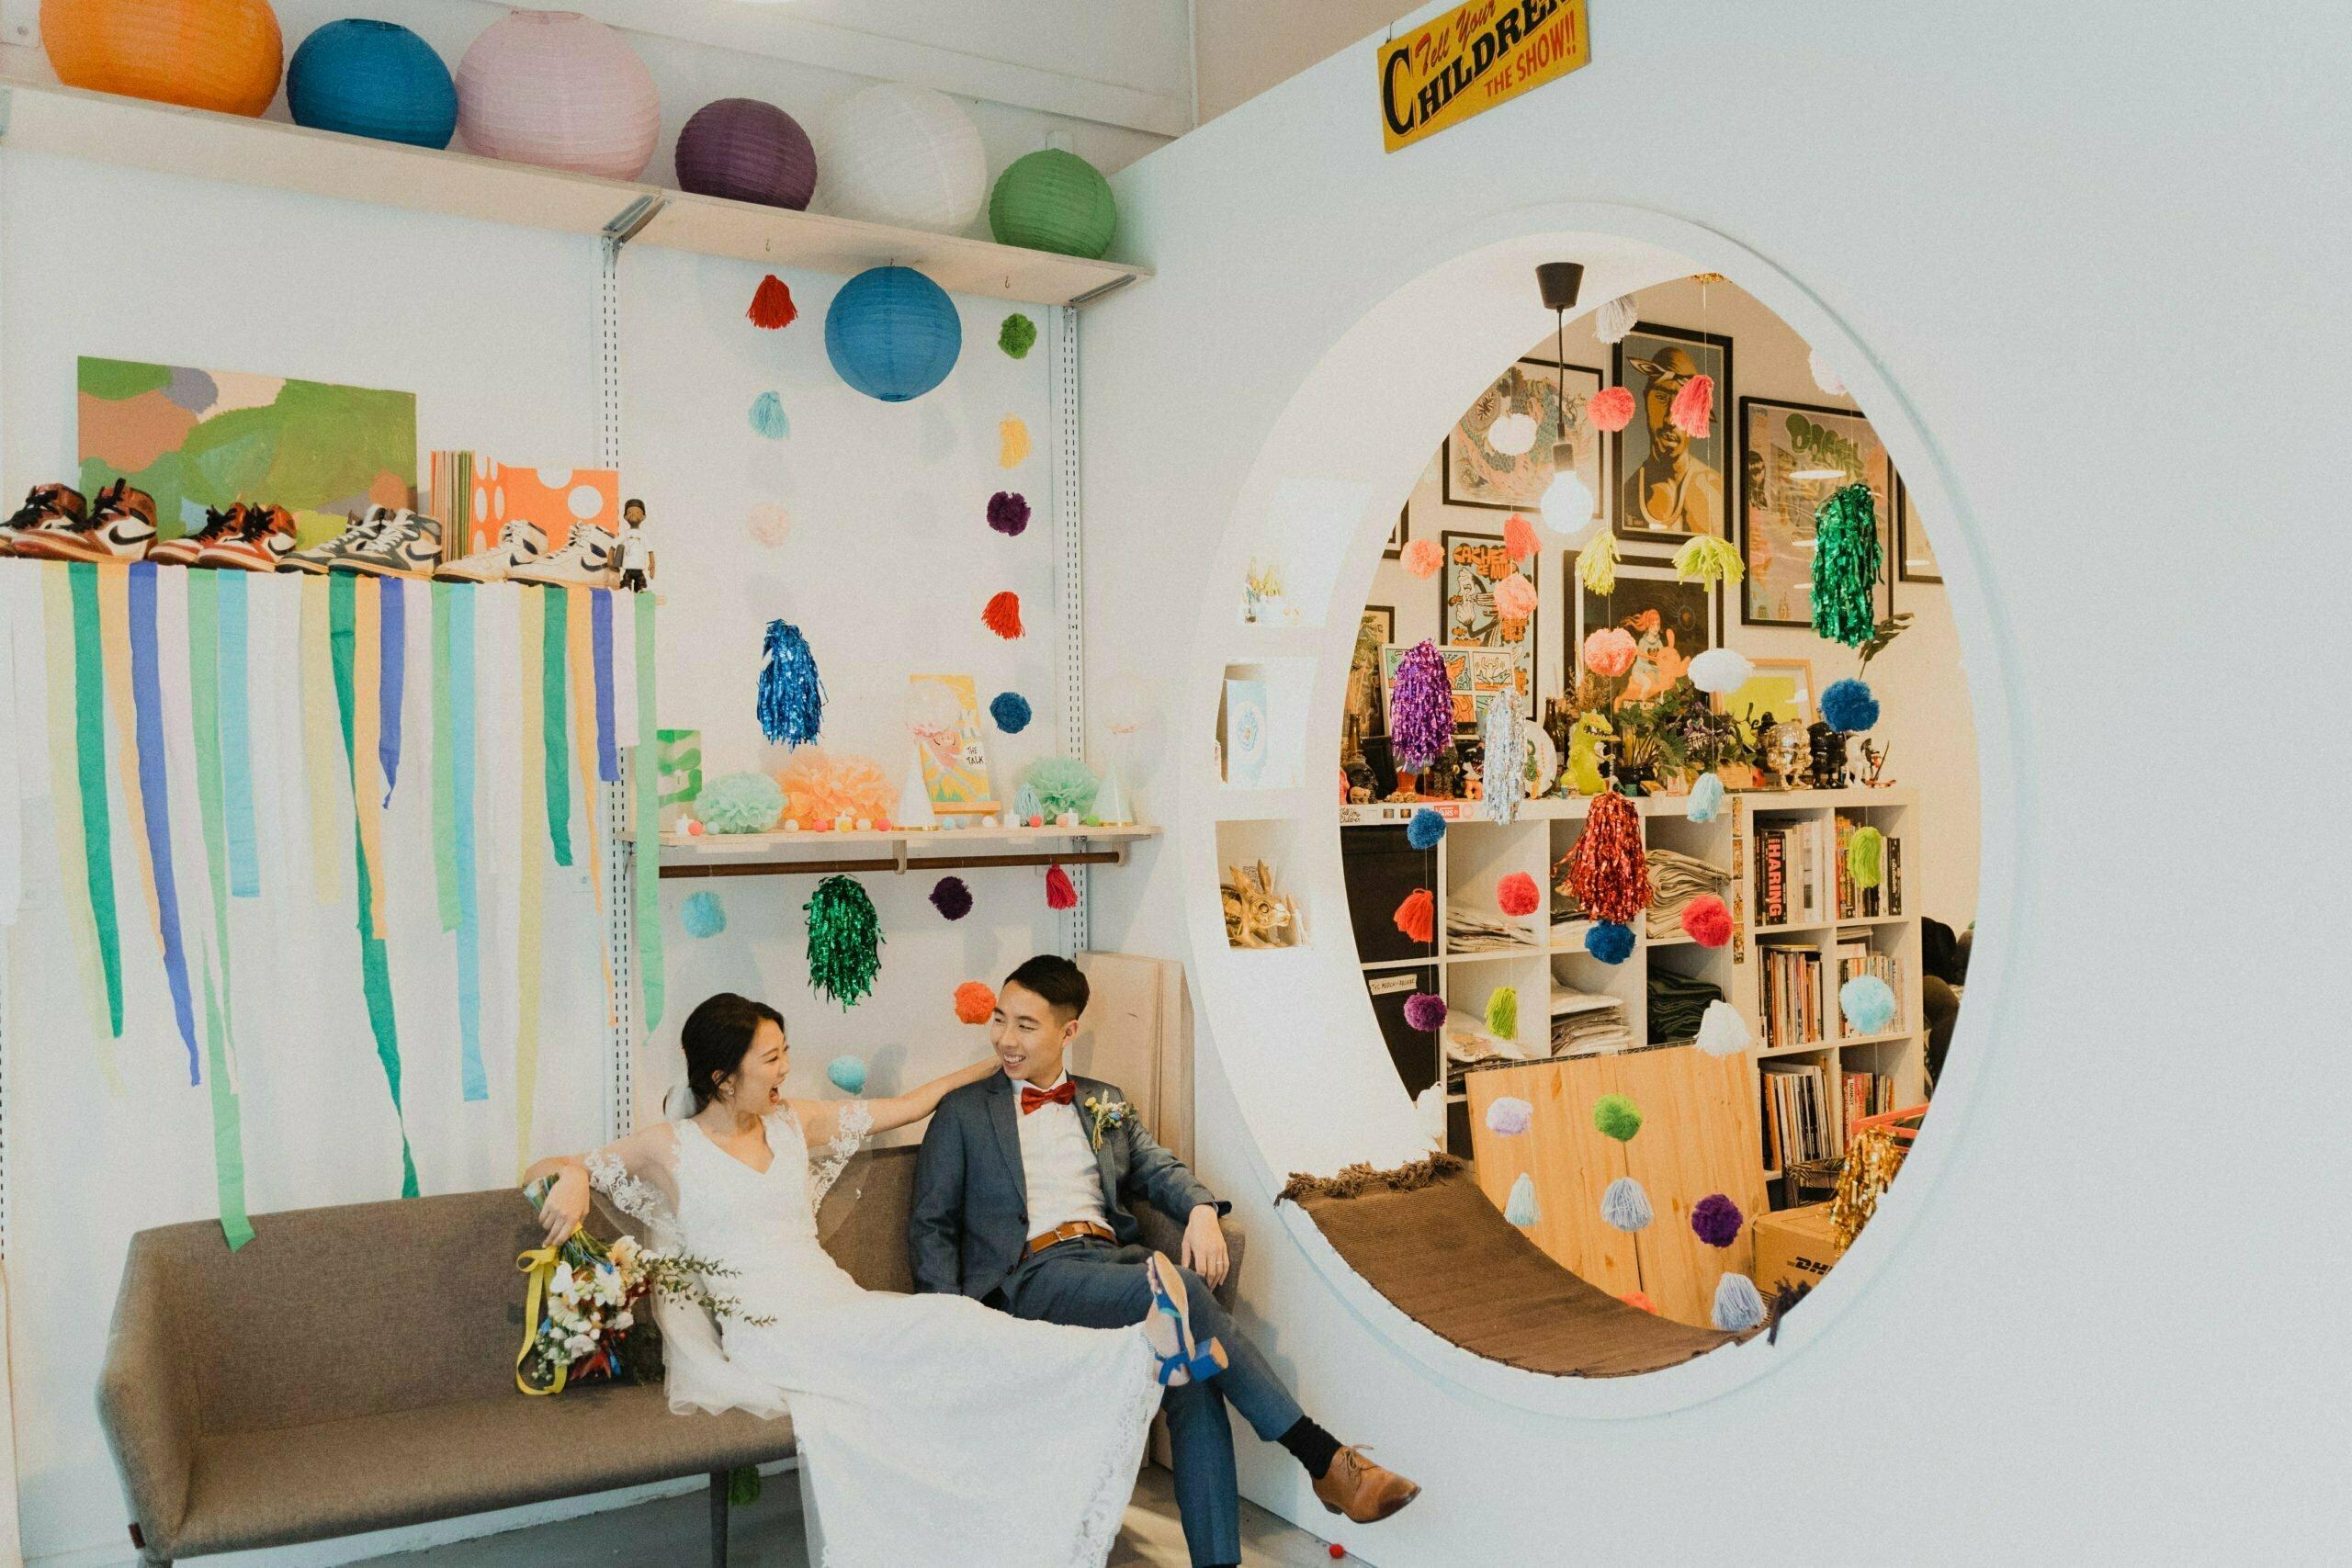 Covid-19 Crashed My Wedding! Isabel Phua Shares Her Story